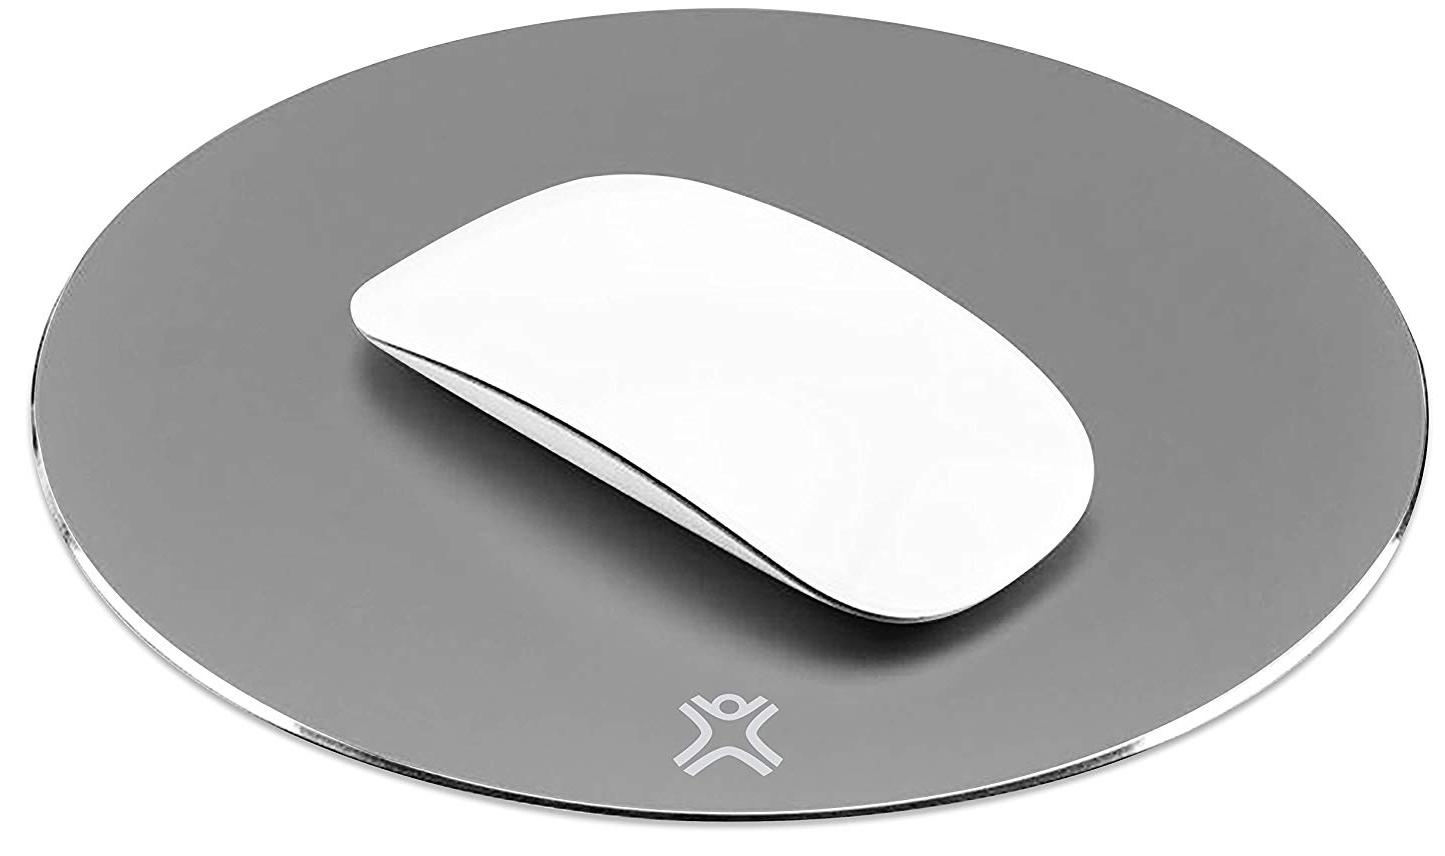 Коврик для мыши Xtrememac Aluminum Mouse Pad XM-MPR-GRY (Space Grey)